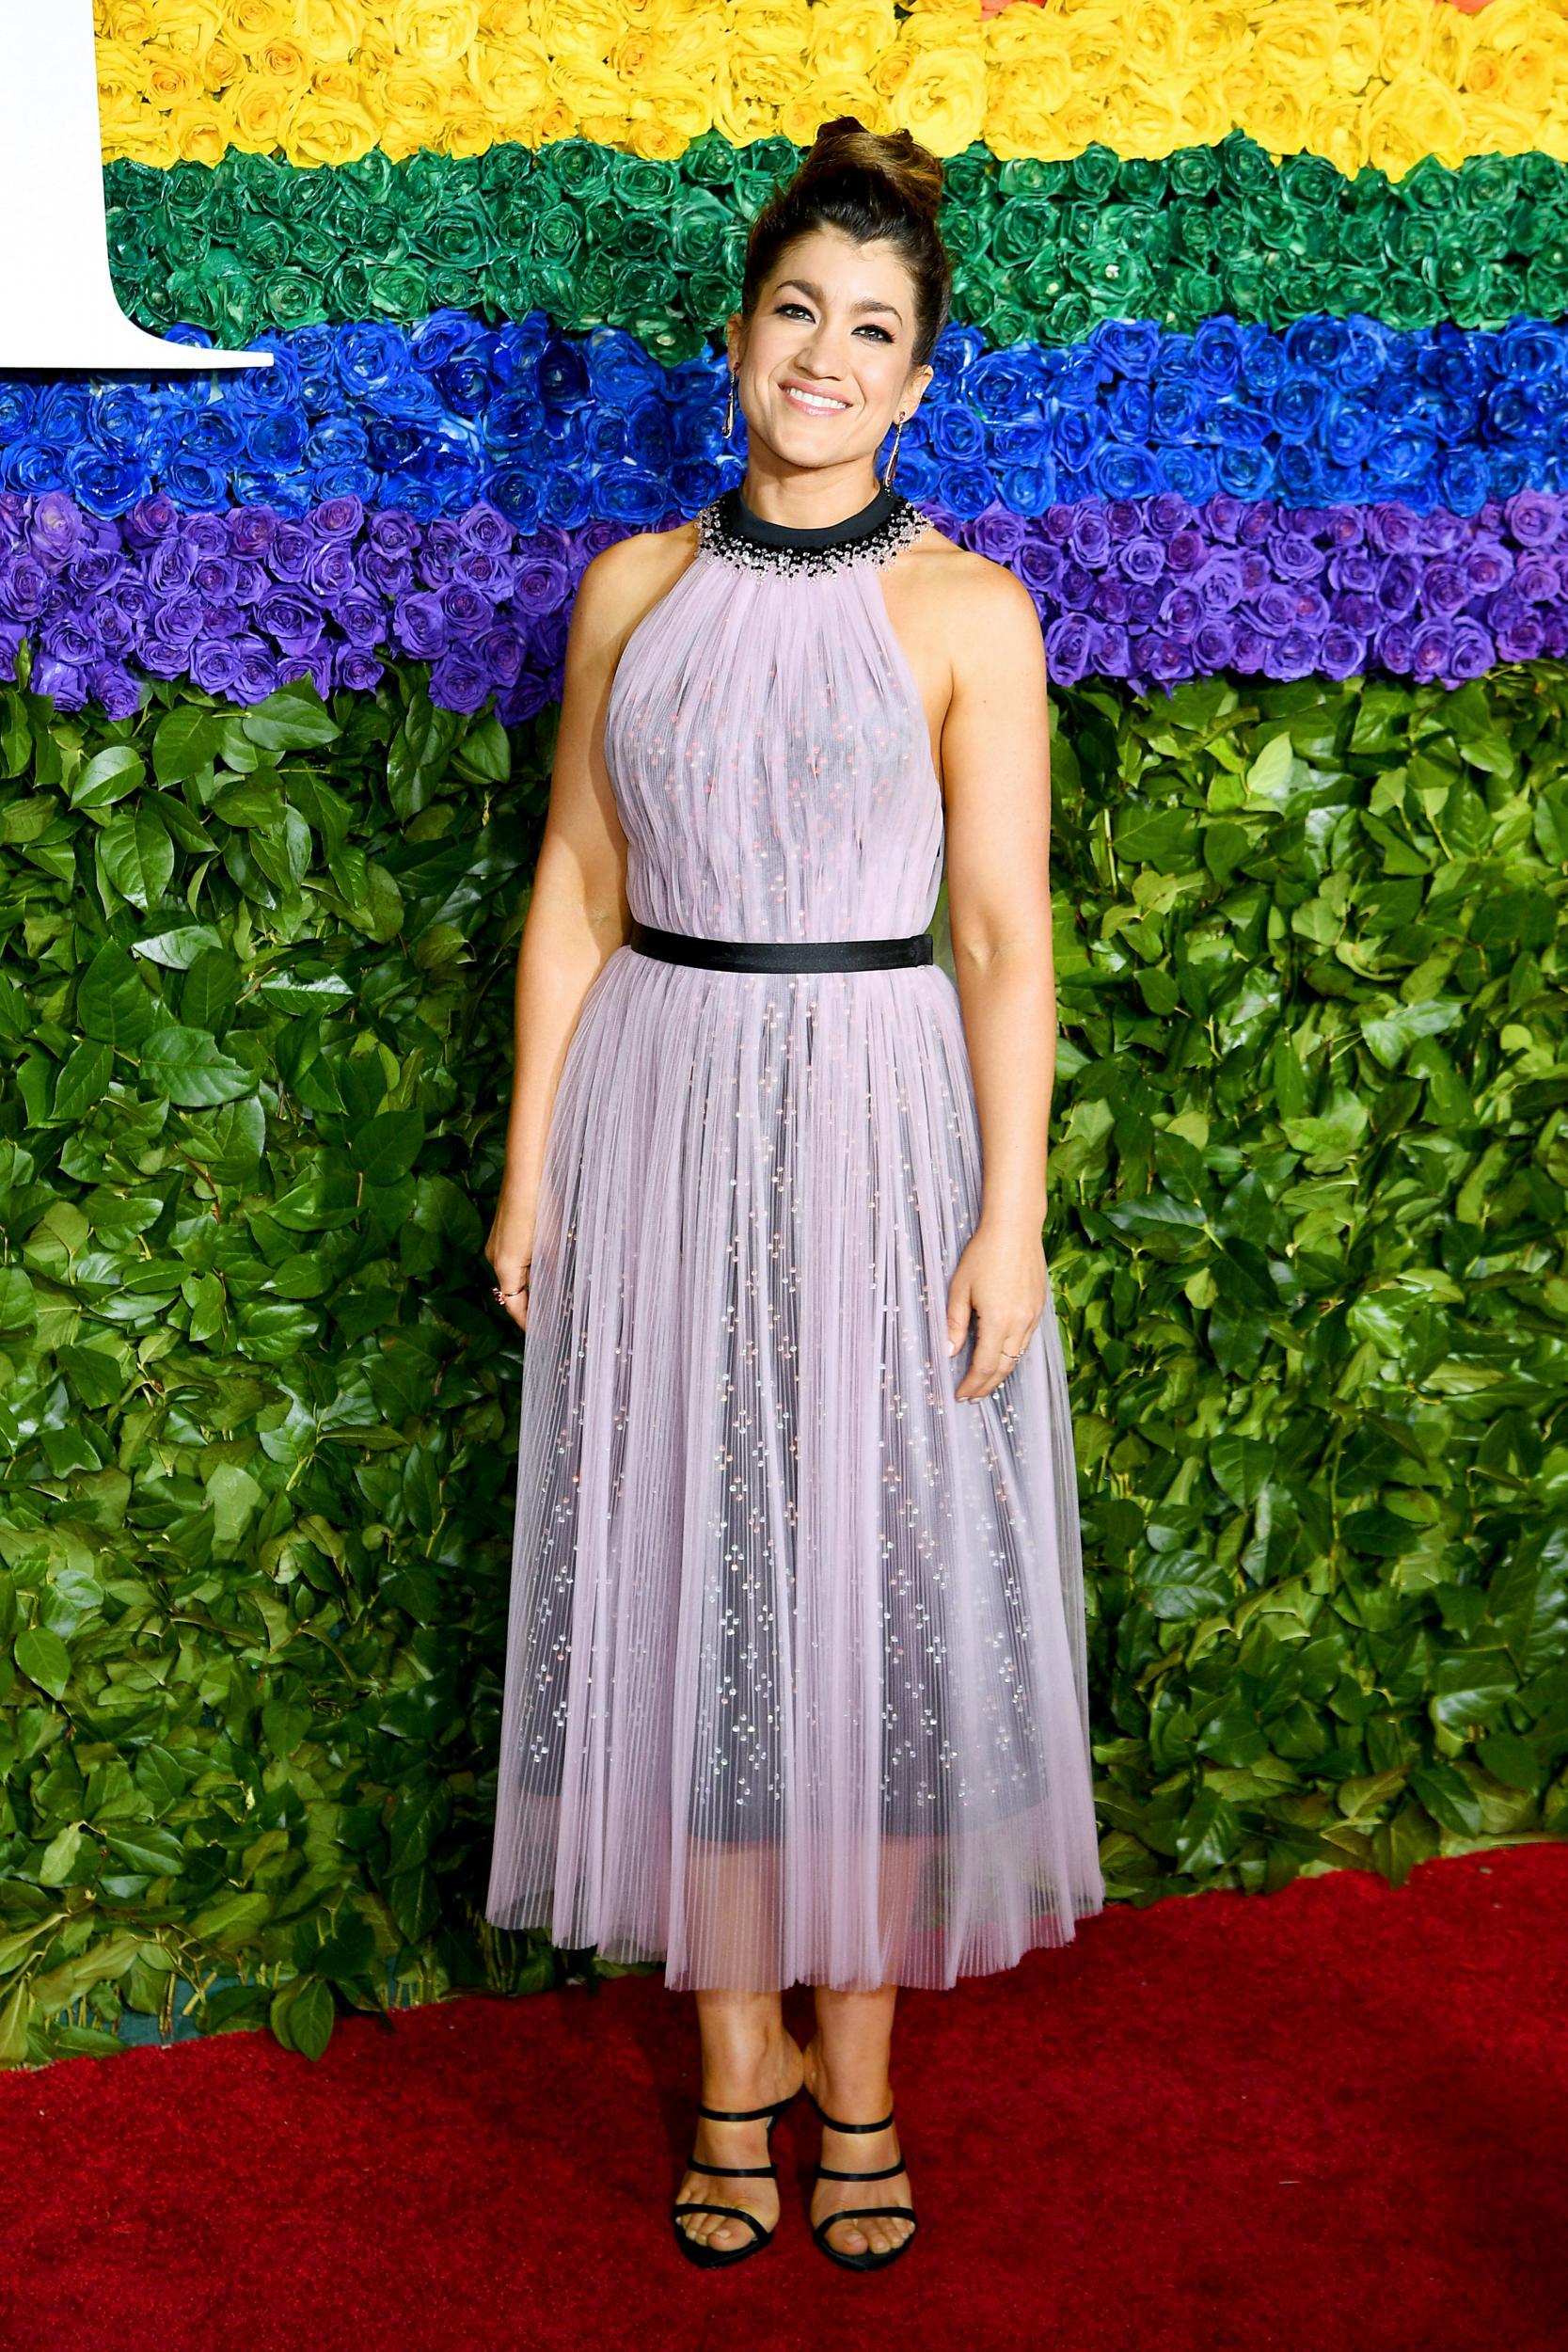 Tony Awards winners: Hadestown dominates as the Ferryman